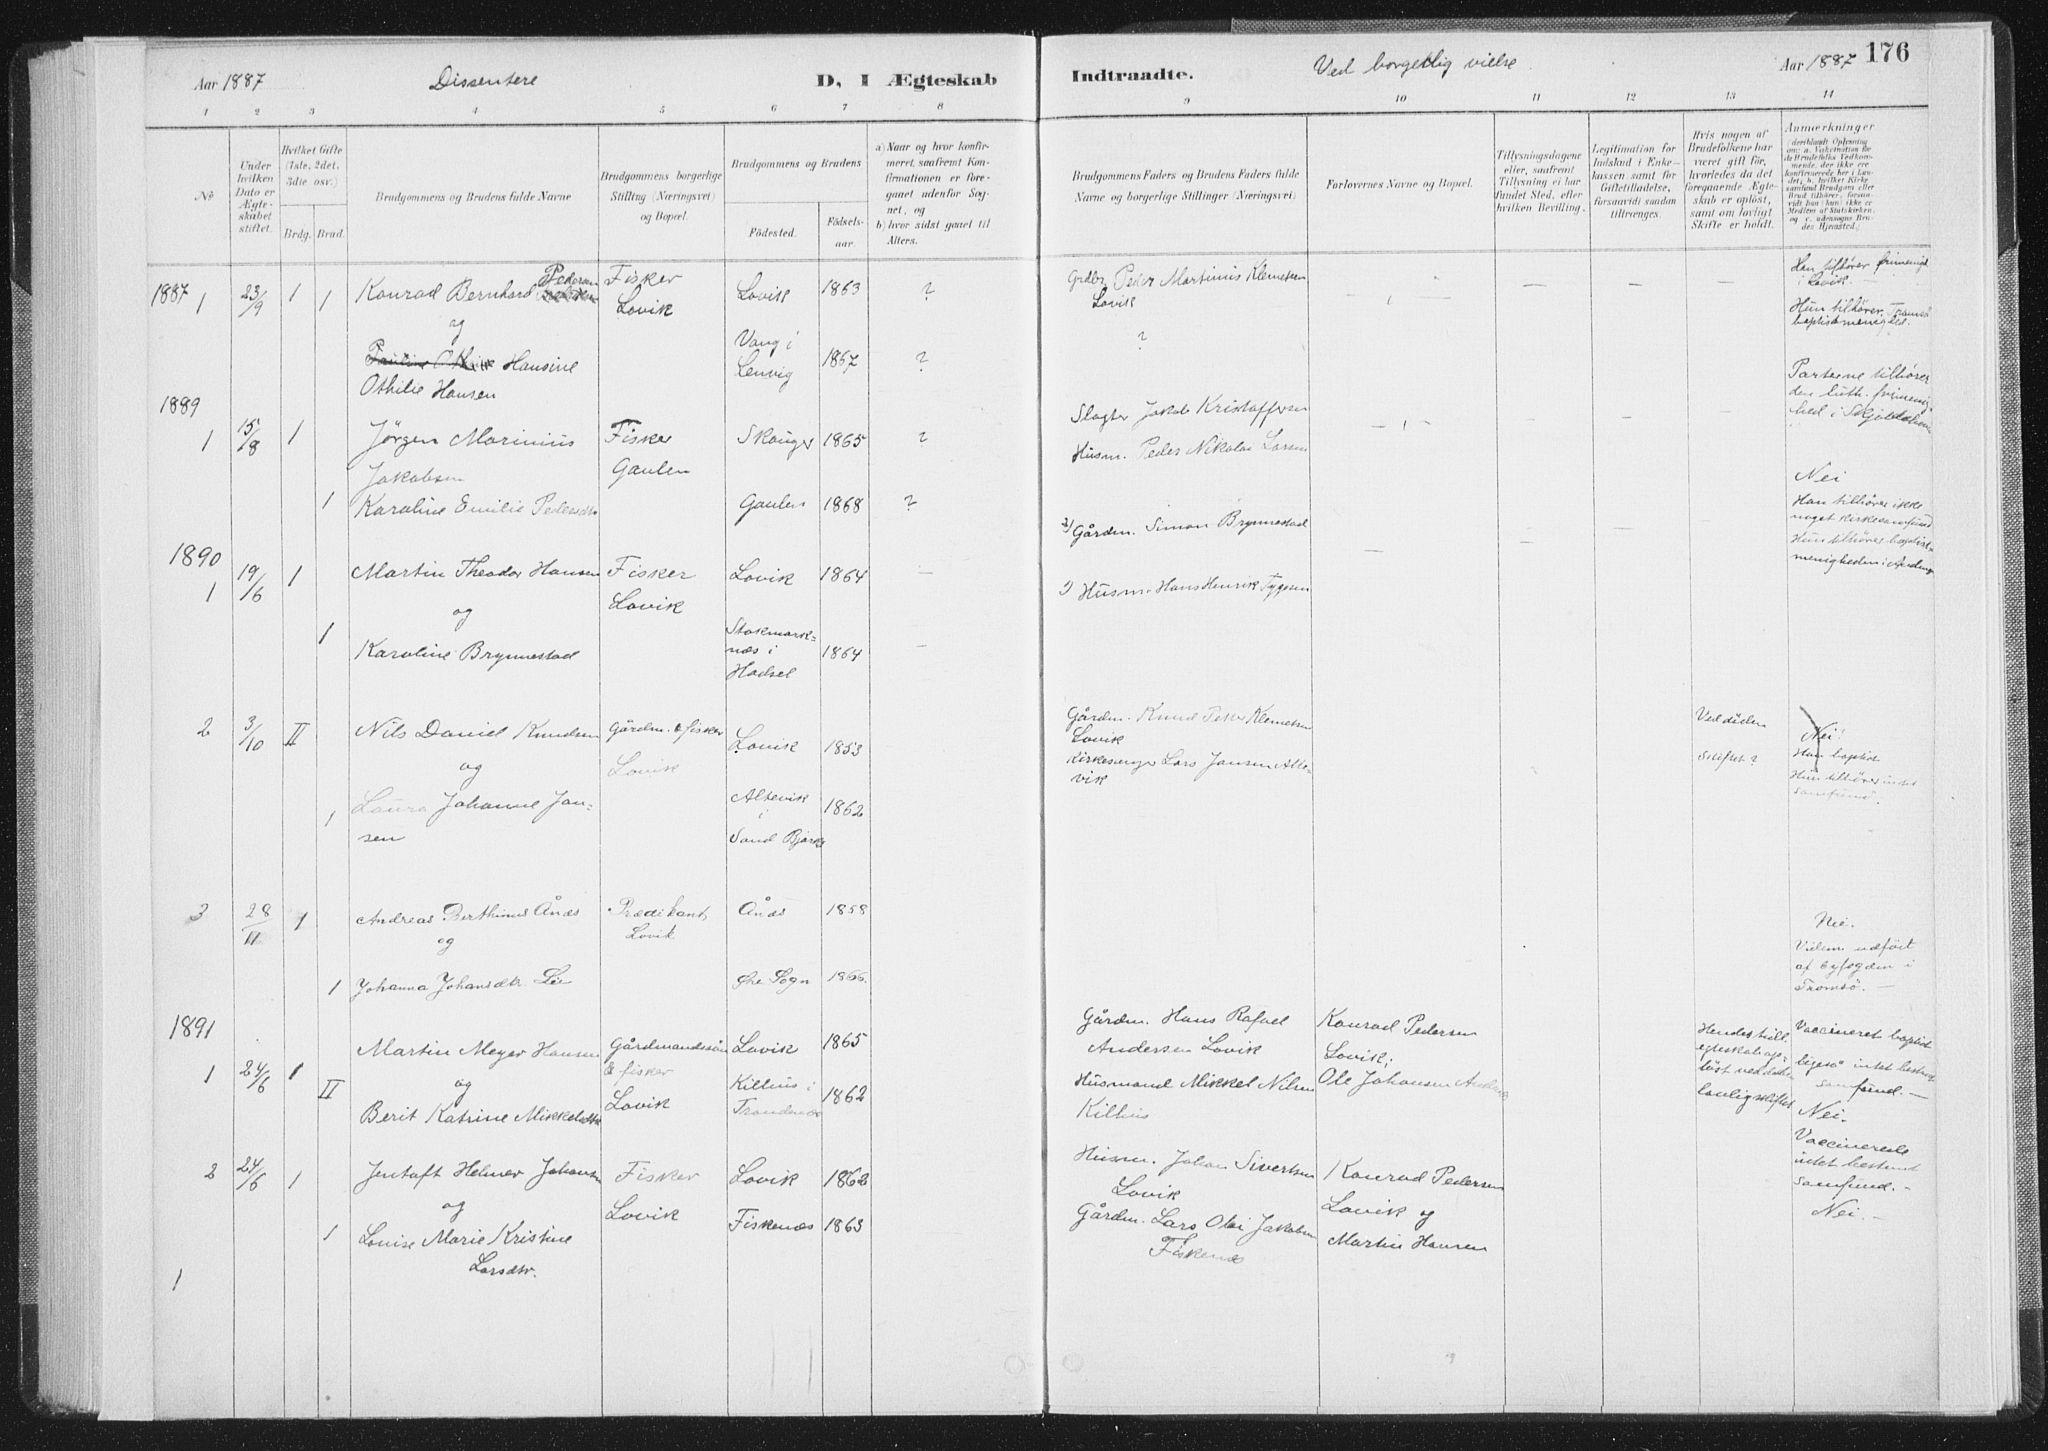 SAT, Ministerialprotokoller, klokkerbøker og fødselsregistre - Nordland, 898/L1422: Ministerialbok nr. 898A02, 1887-1908, s. 176